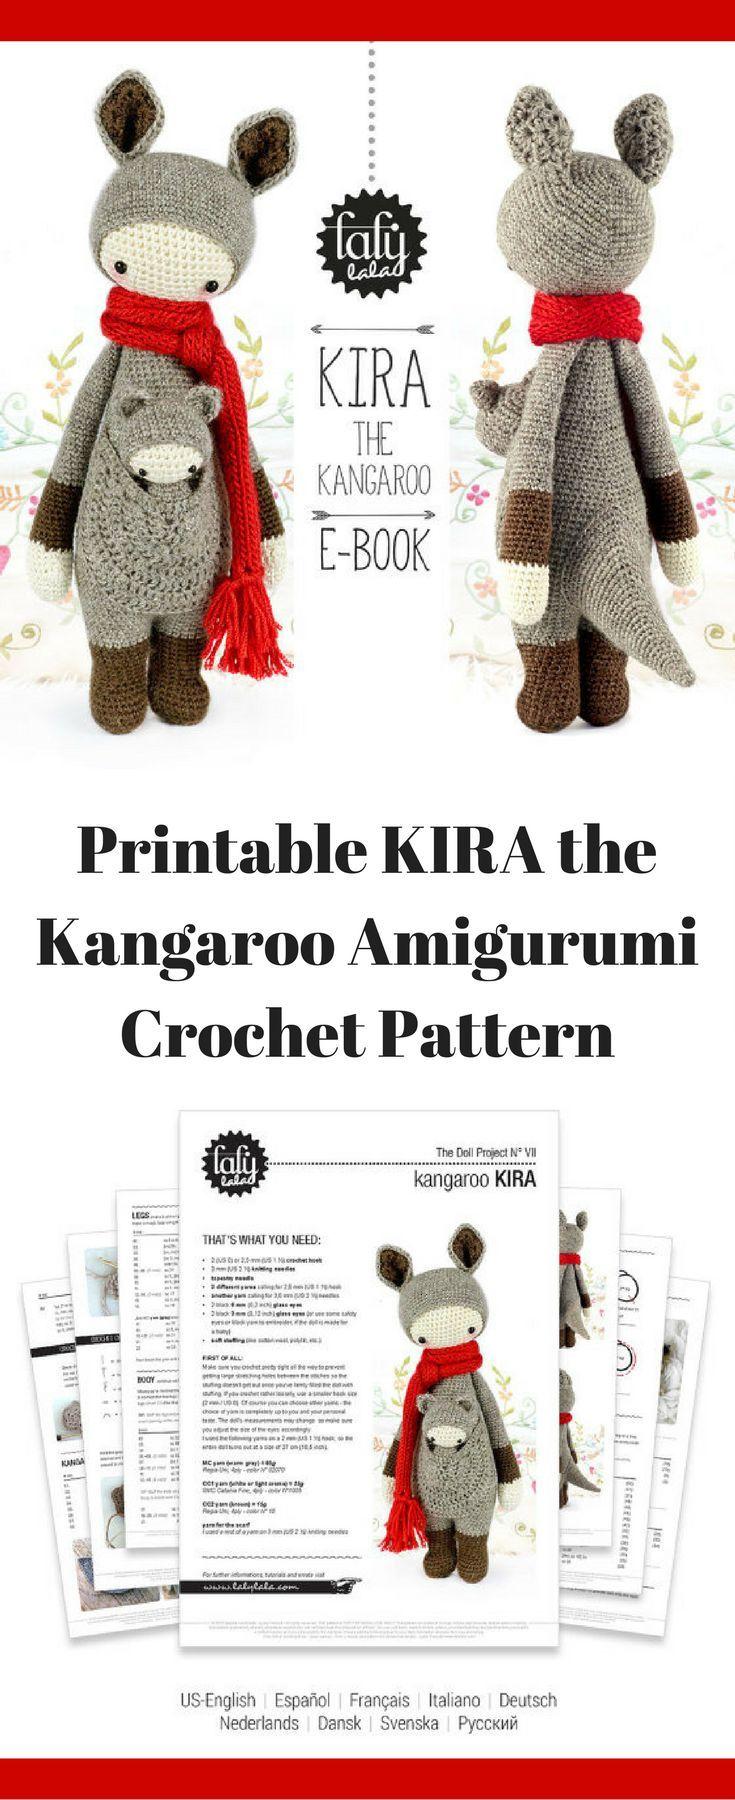 Kira the Kangaroo amigurumi crochet pattern #ad #amigurumis #amigurumidoll #amigurumilove #amigurumitoy #amigurumipattern #crochet #crochetaddict #crochetlove #crochetpattern